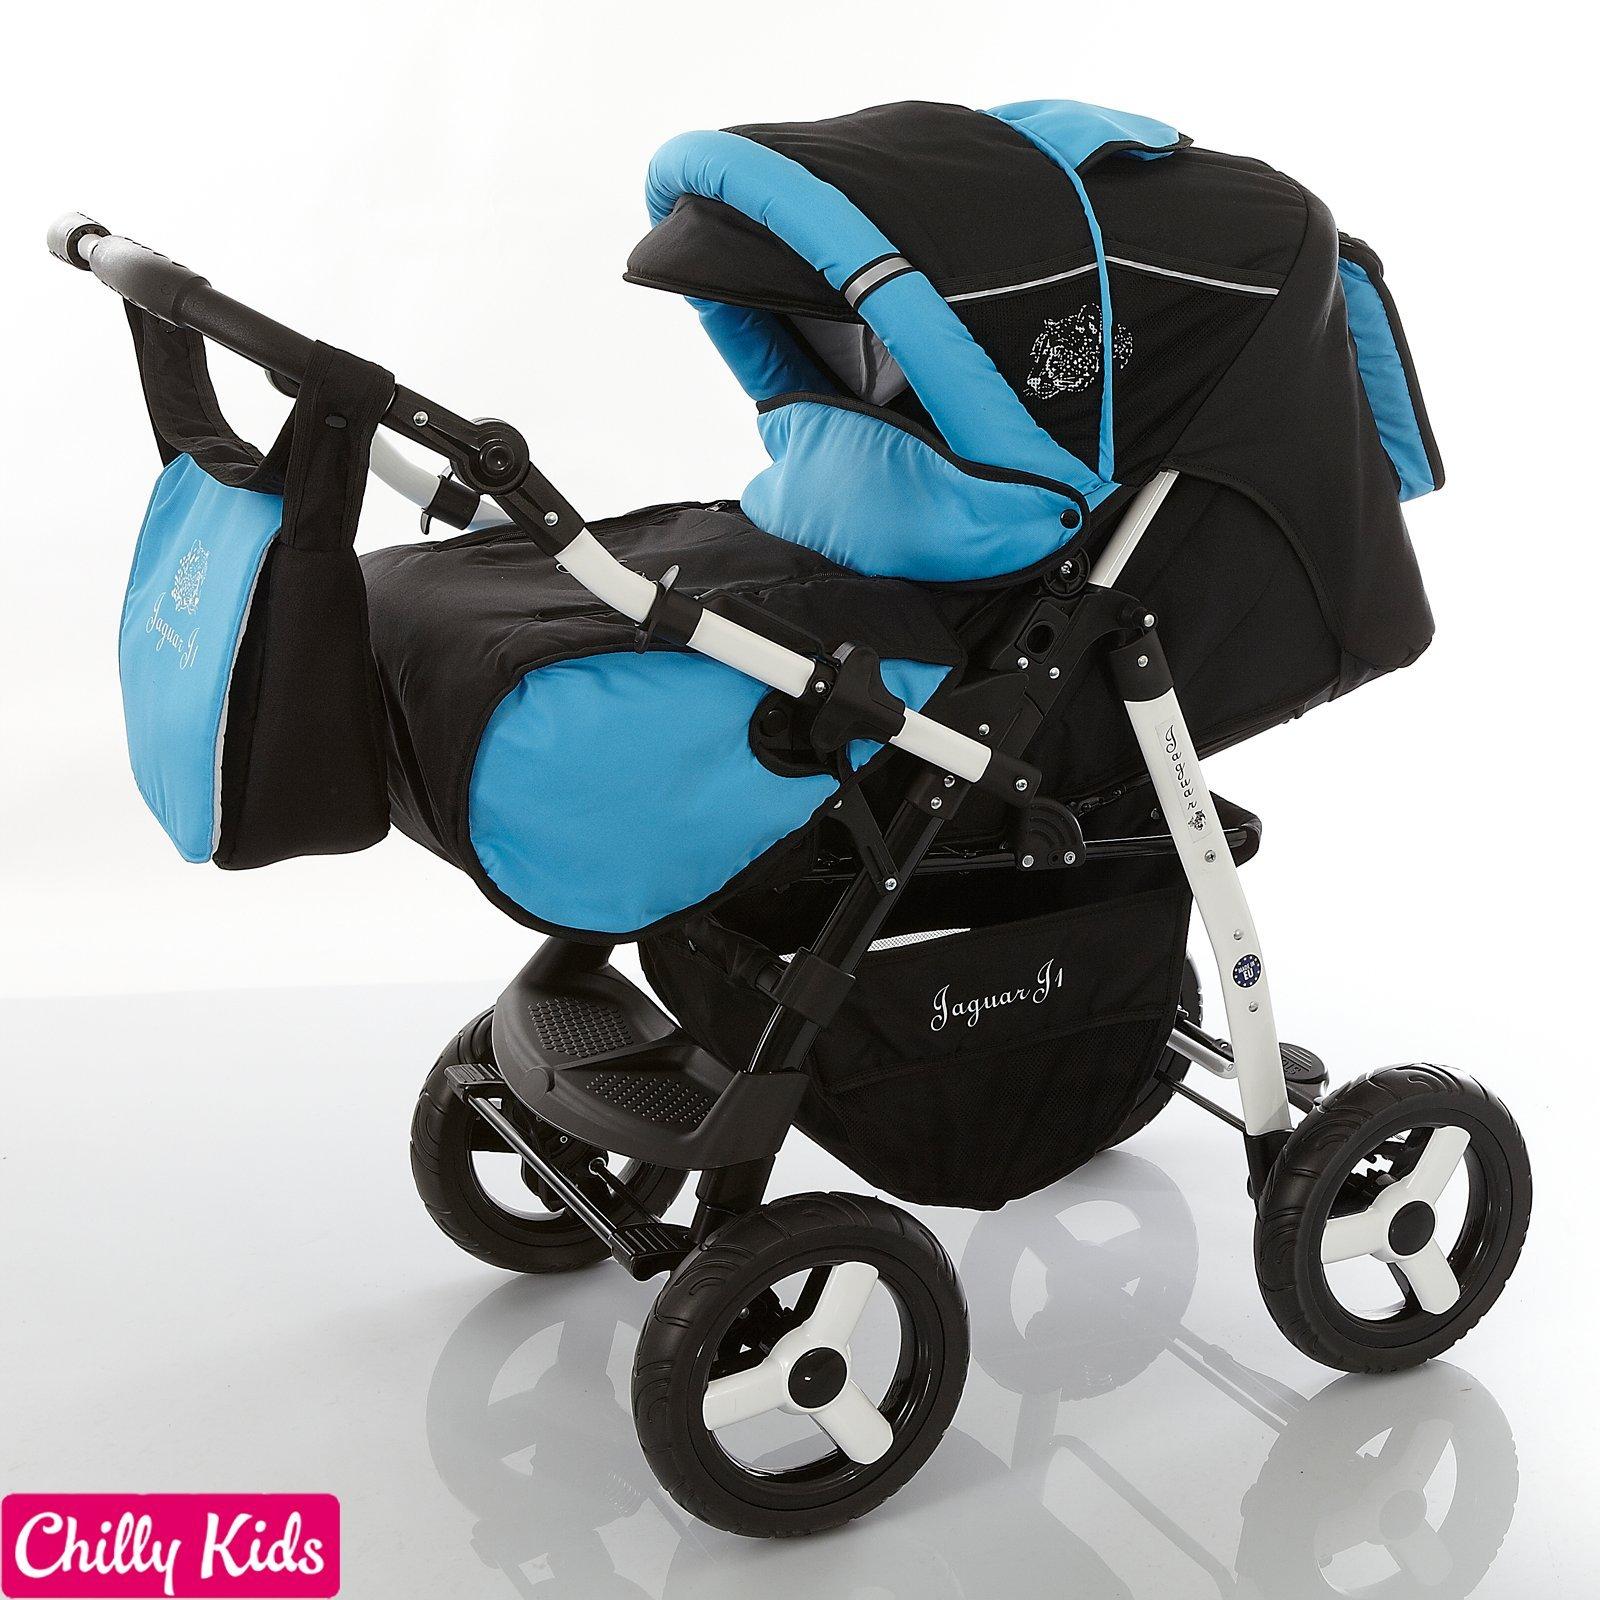 Chilly Kids Jaguar 2 in 1 Pram Combi Stroller & Pushchair (rain cover, mosquito net, 07 colors) 30 Black Shadow & Aqua